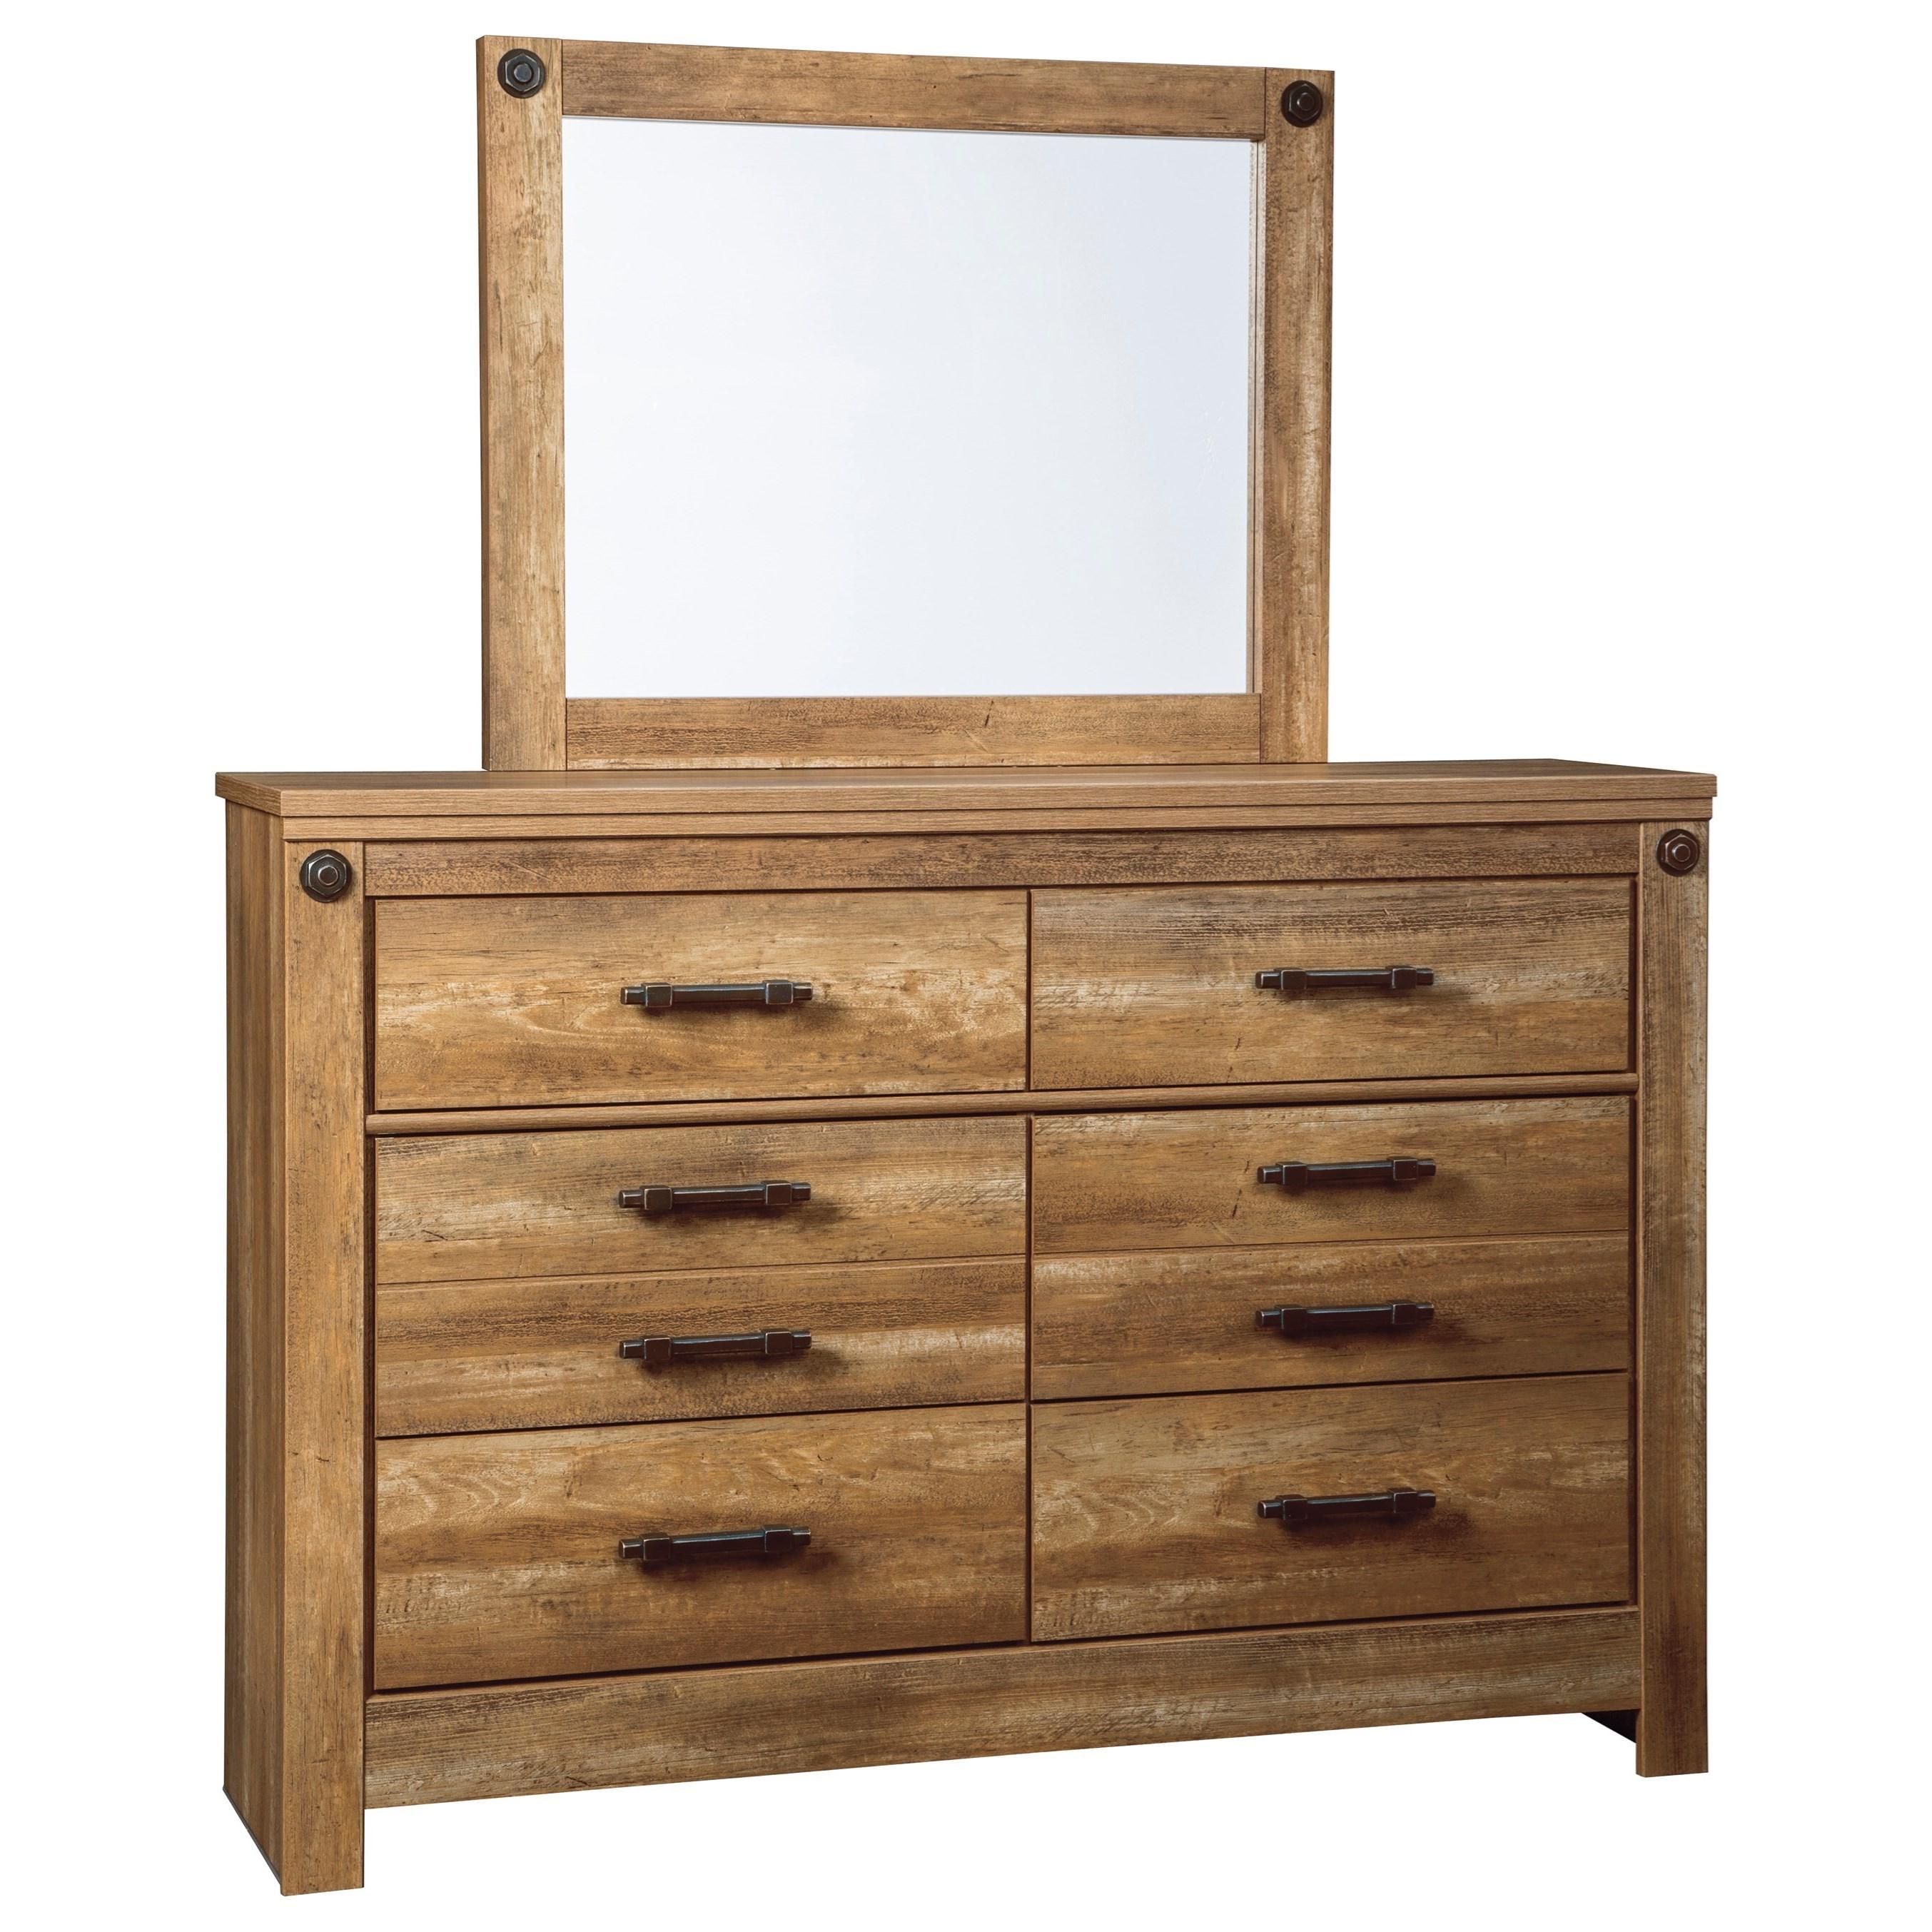 Signature Design by Ashley Ladimier Dresser & Bedroom Mirror - Item Number: B399-31+36